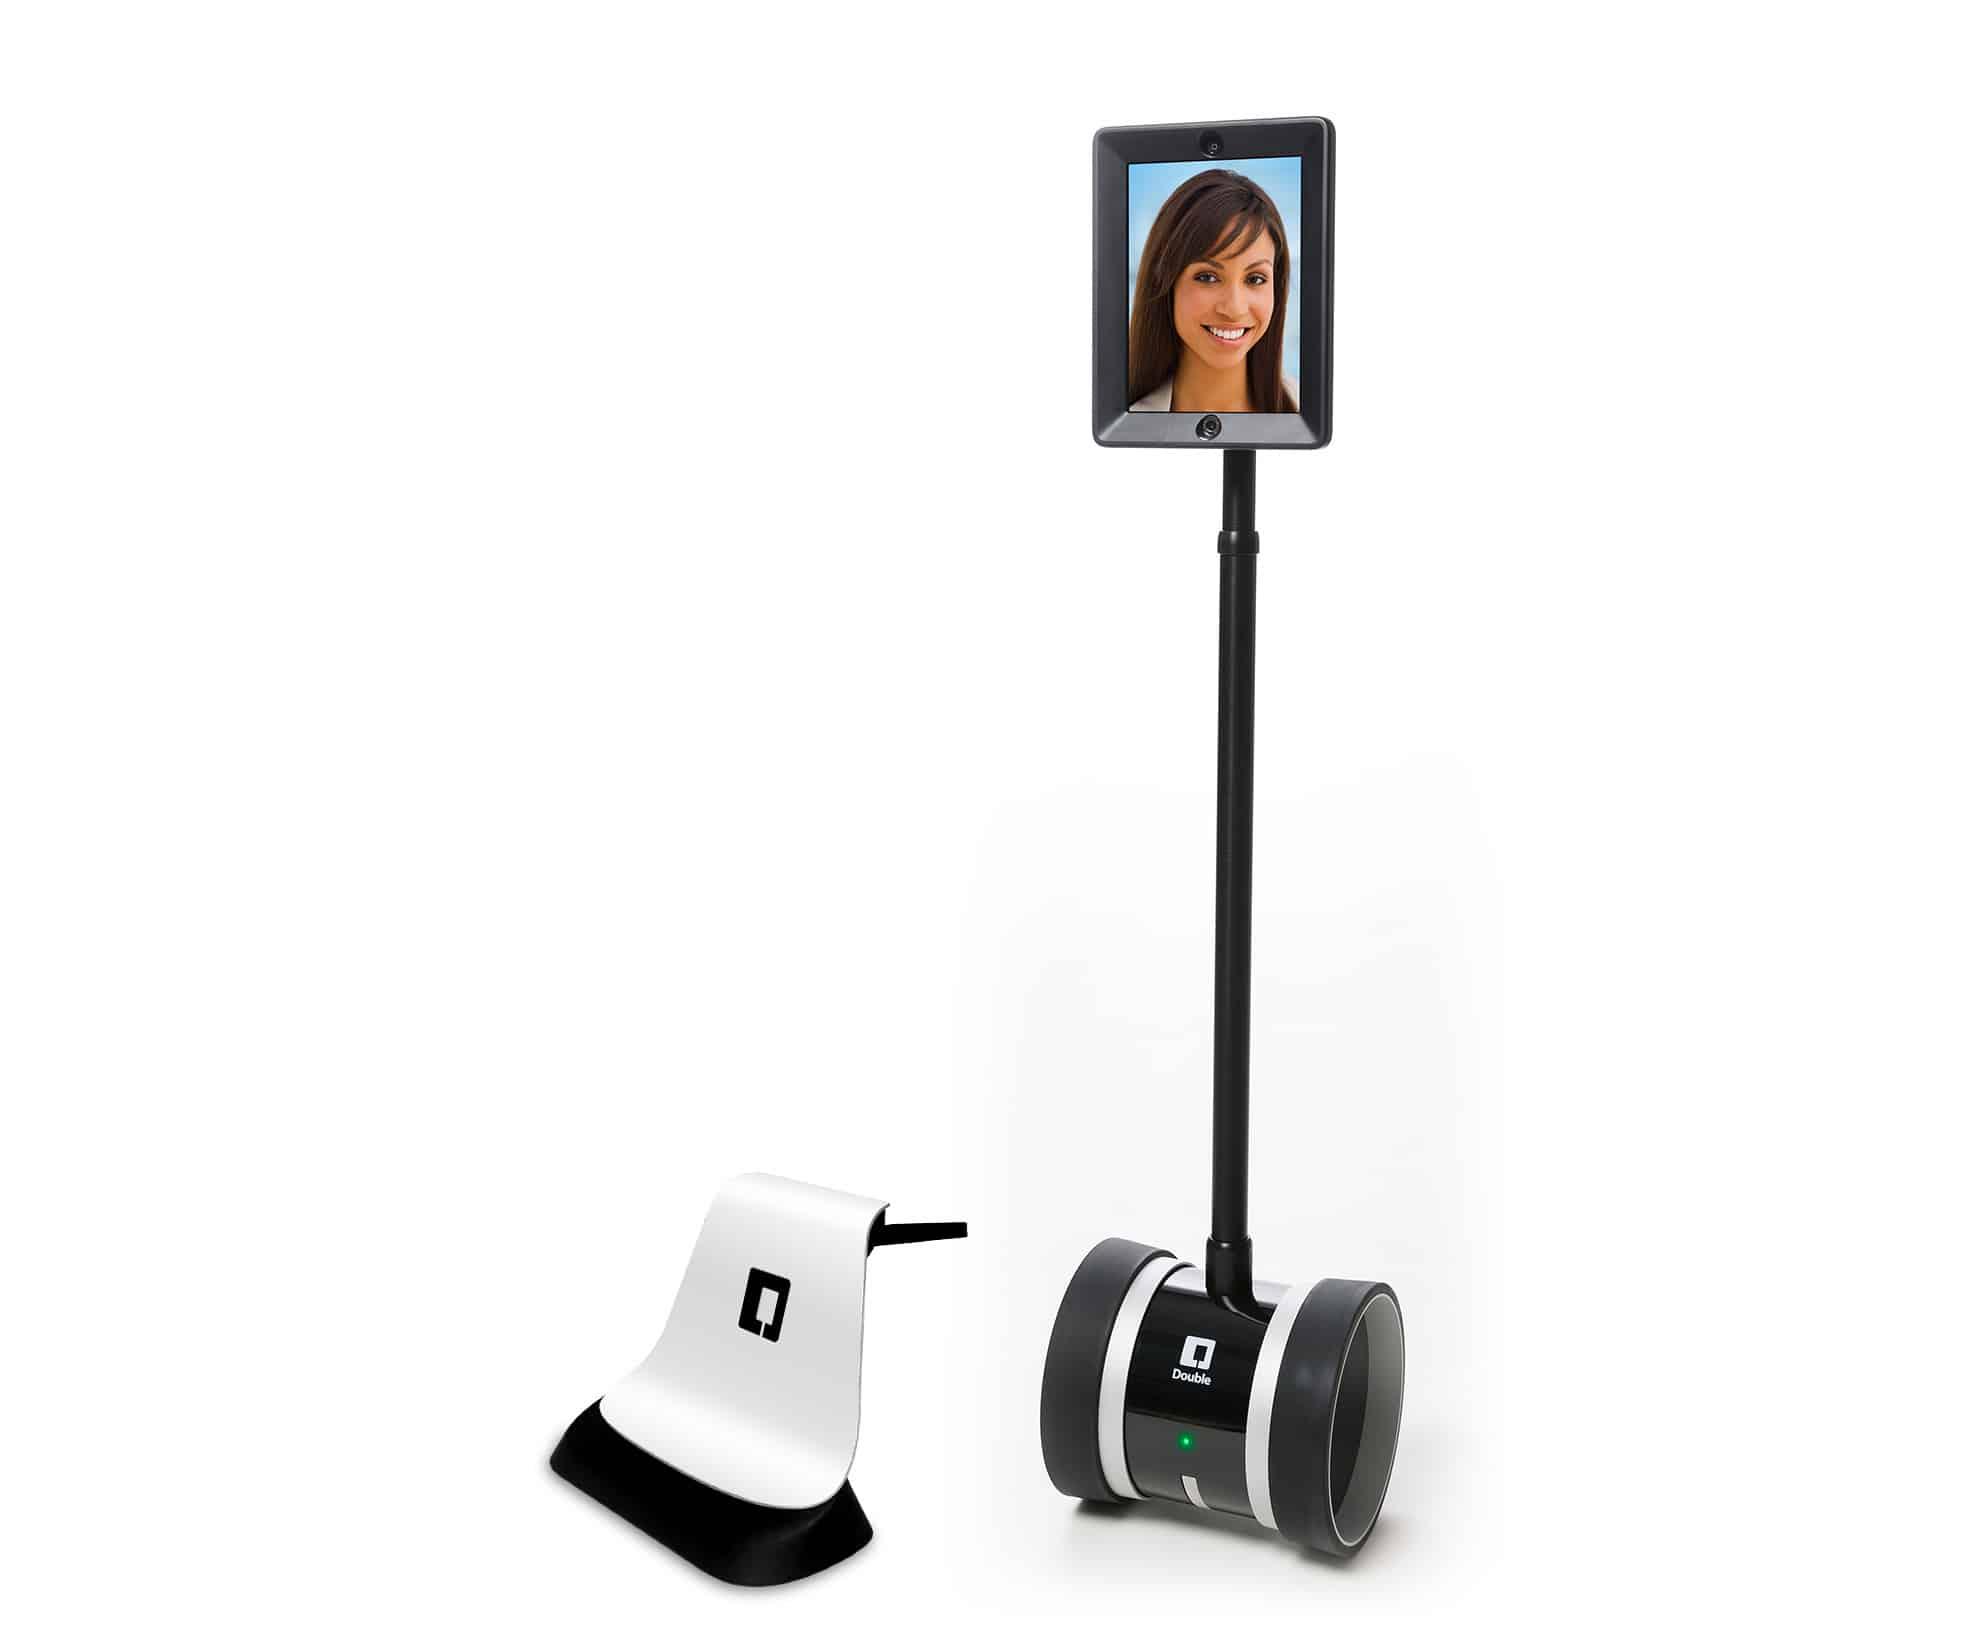 Double Robotics with Charging Dock